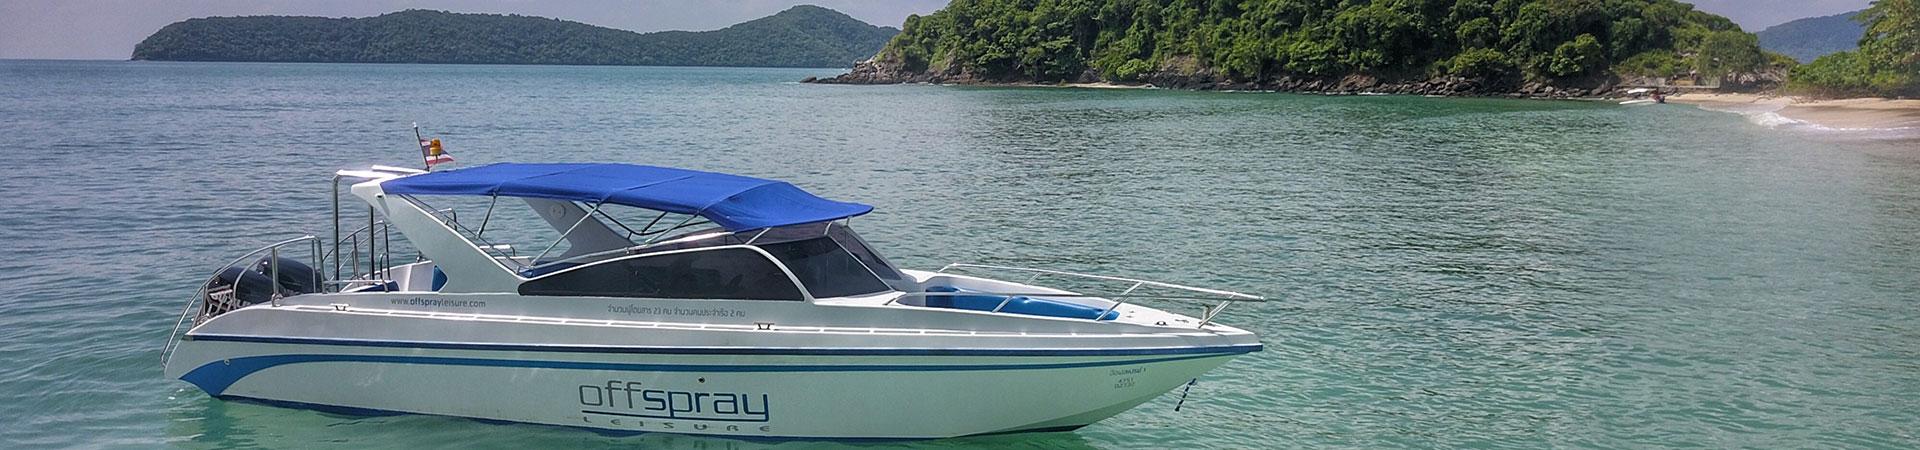 Private Boat Charter Phuket